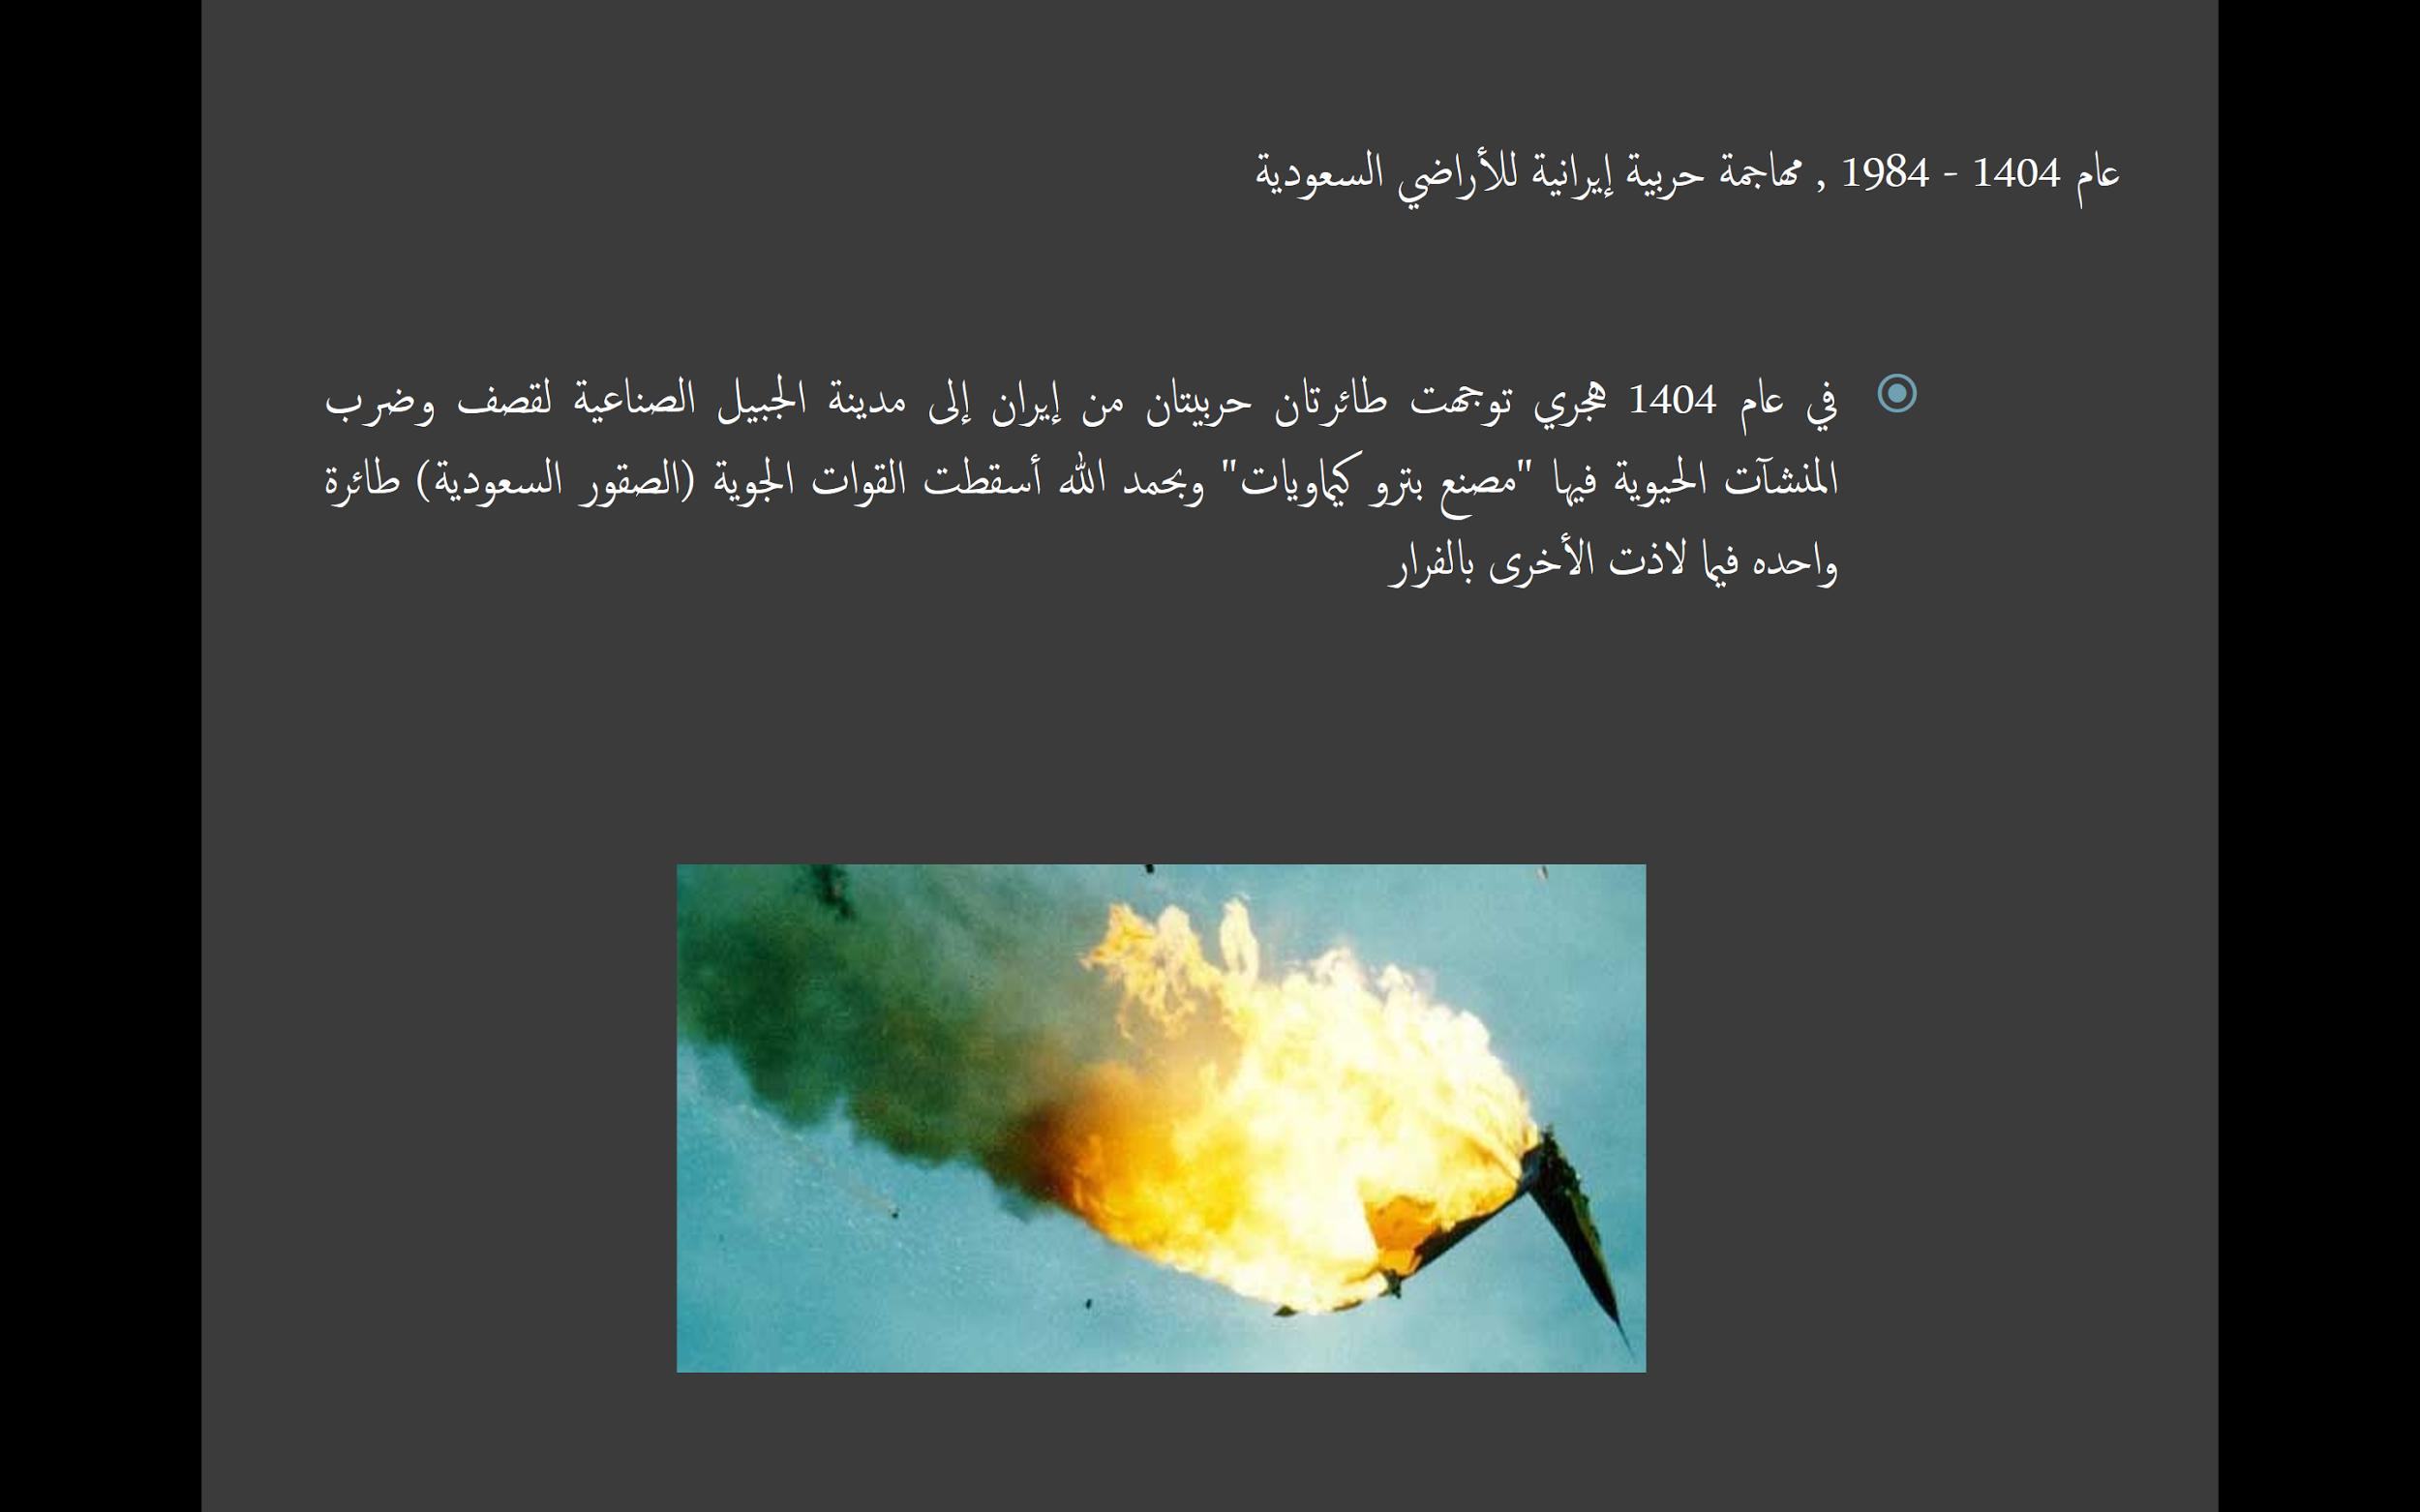 6-figure-2-screenshot-iranian-attack-1984.png